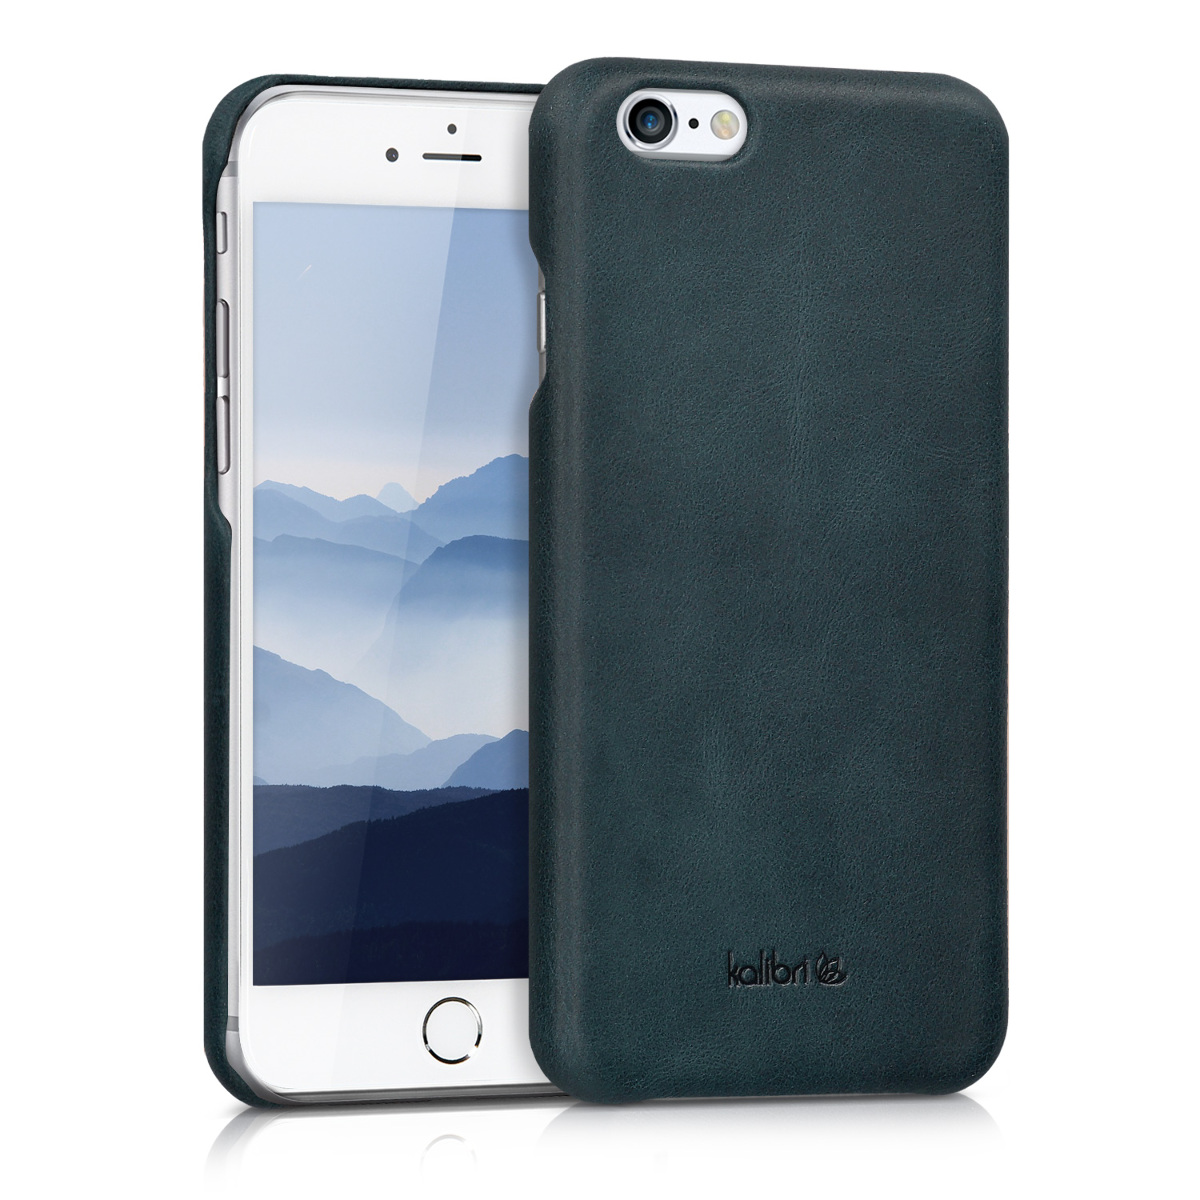 Kalibri Σκληρή Δερμάτινη Θήκη iPhone 6 / 6S - Dark Blue (38961.17)